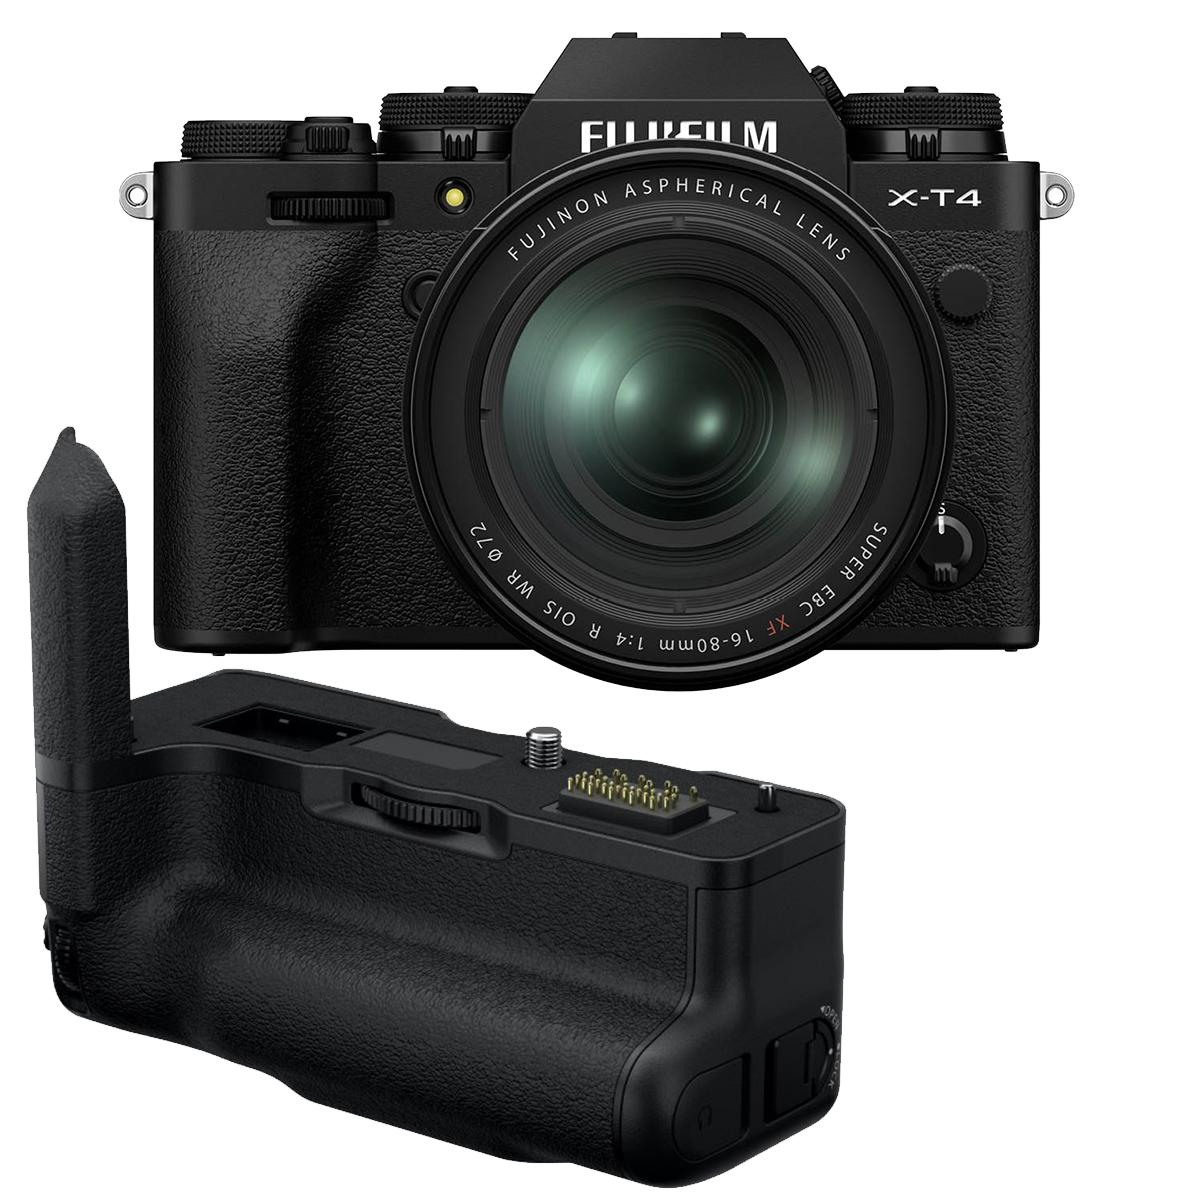 Fujifilm X-T4 Kit mit 16-80 mm 1:4,0 + VG-XT4 Handgriff